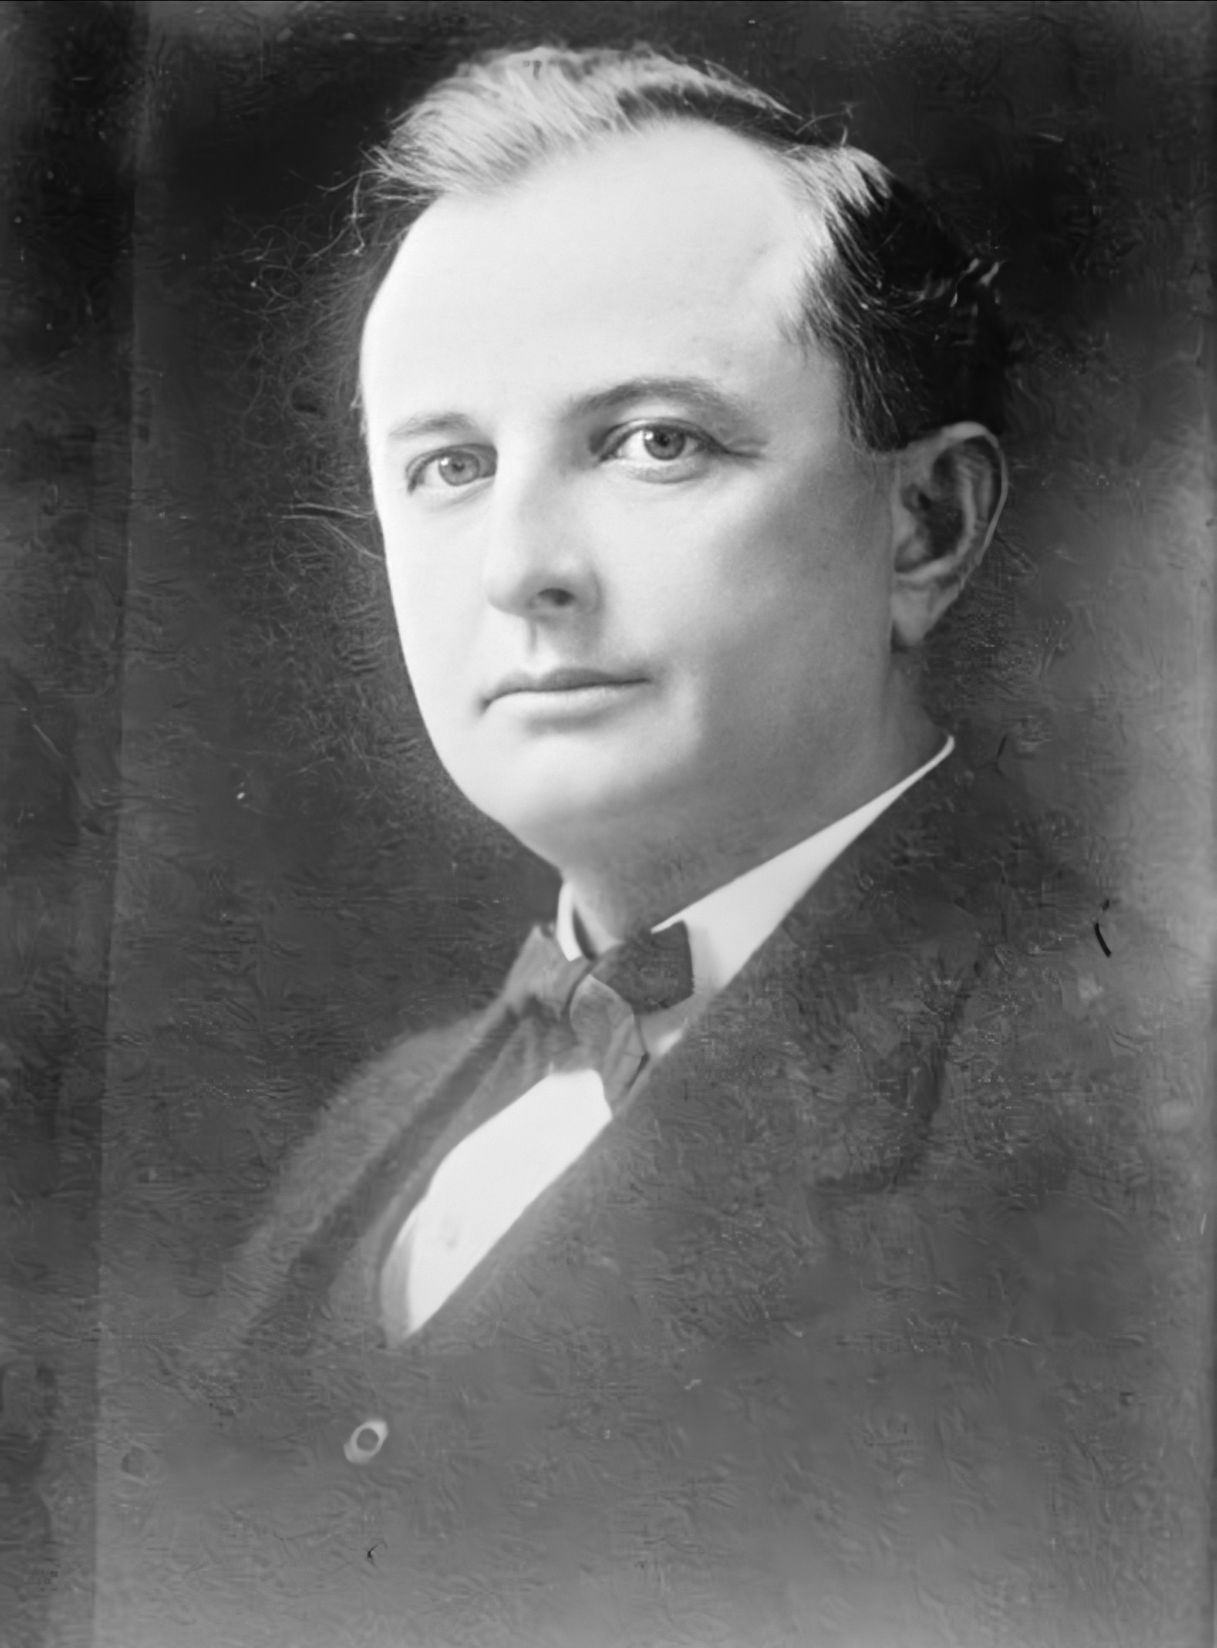 James Ferguson Jr